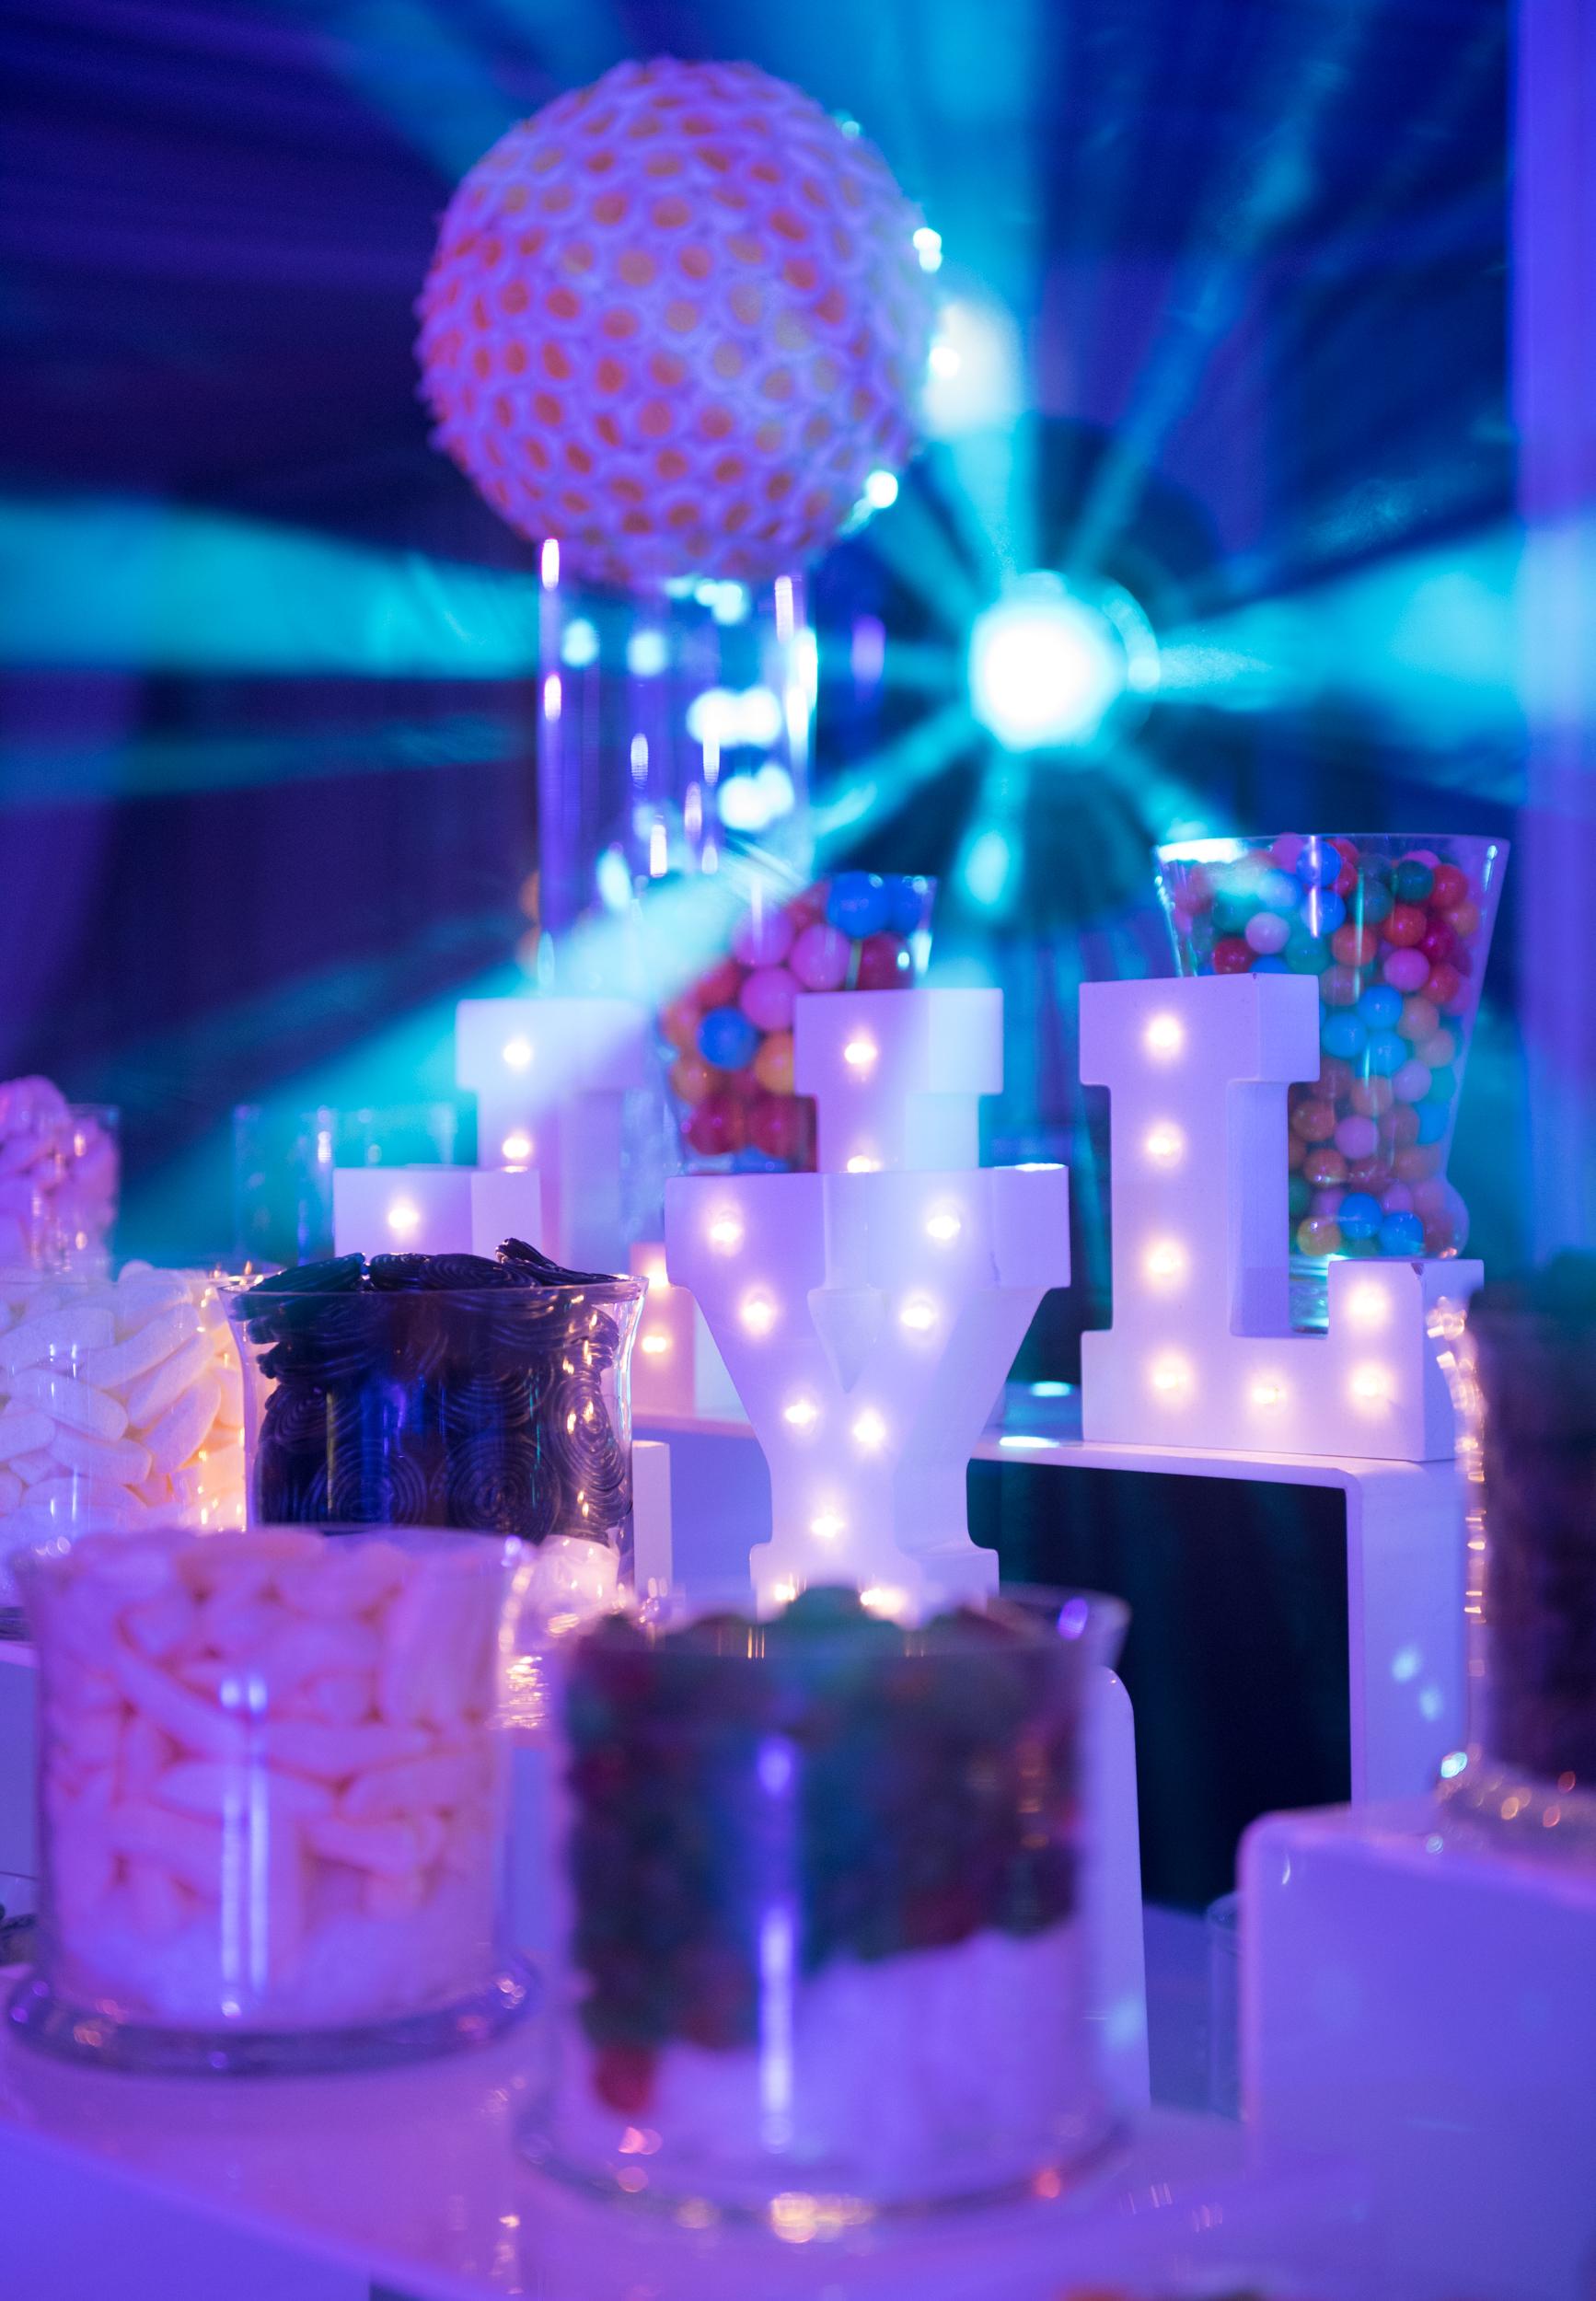 candy bar, party, candy, fête, bonbons,soirée